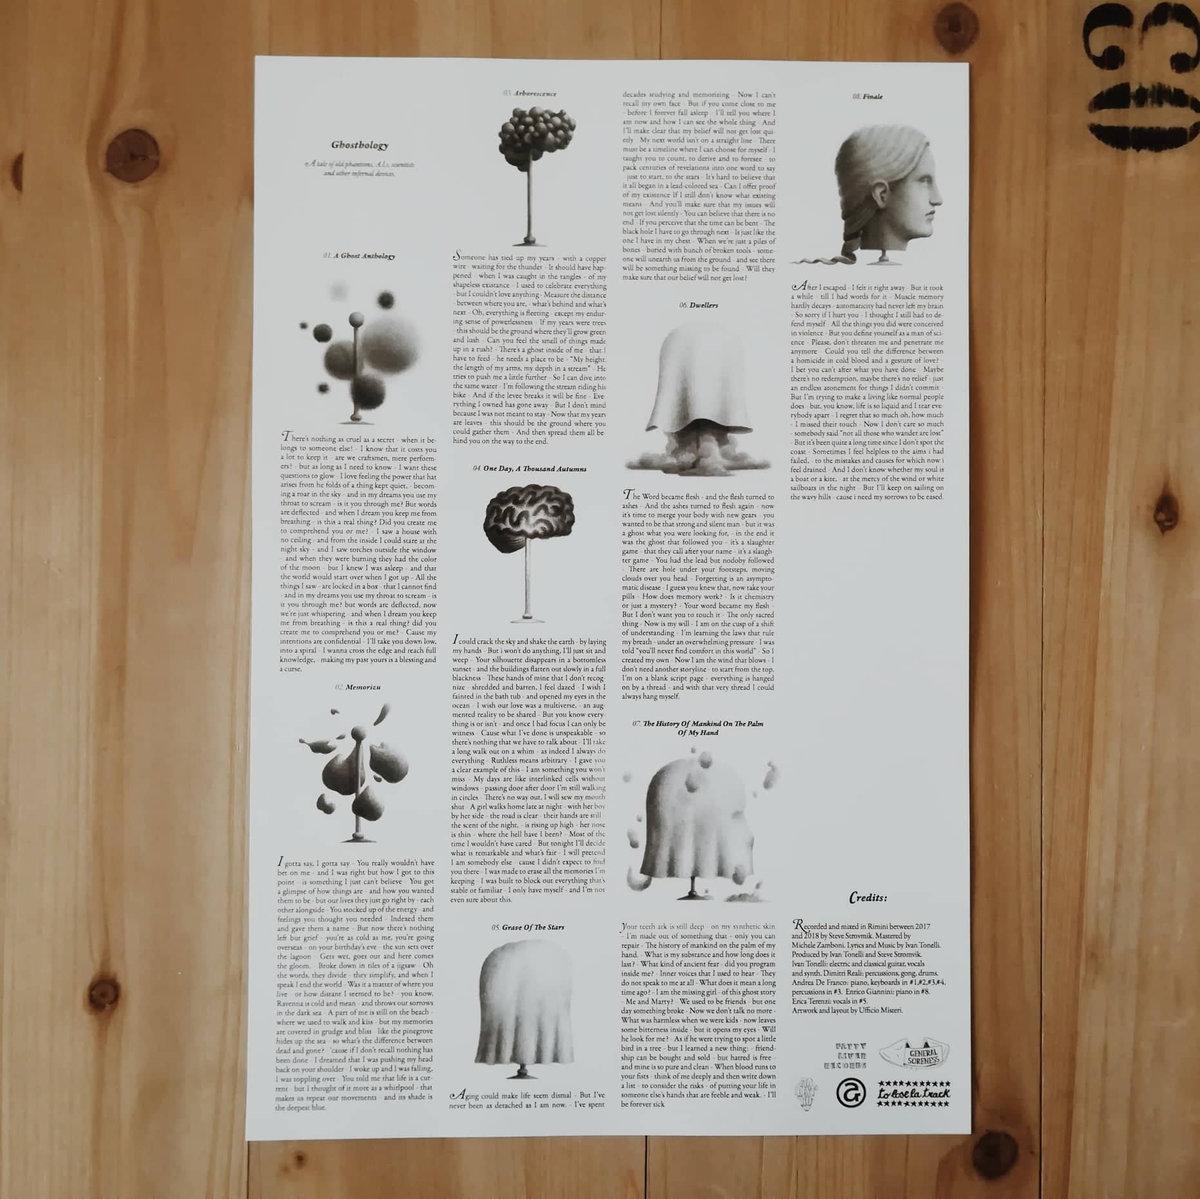 Urali - Ghostology CD